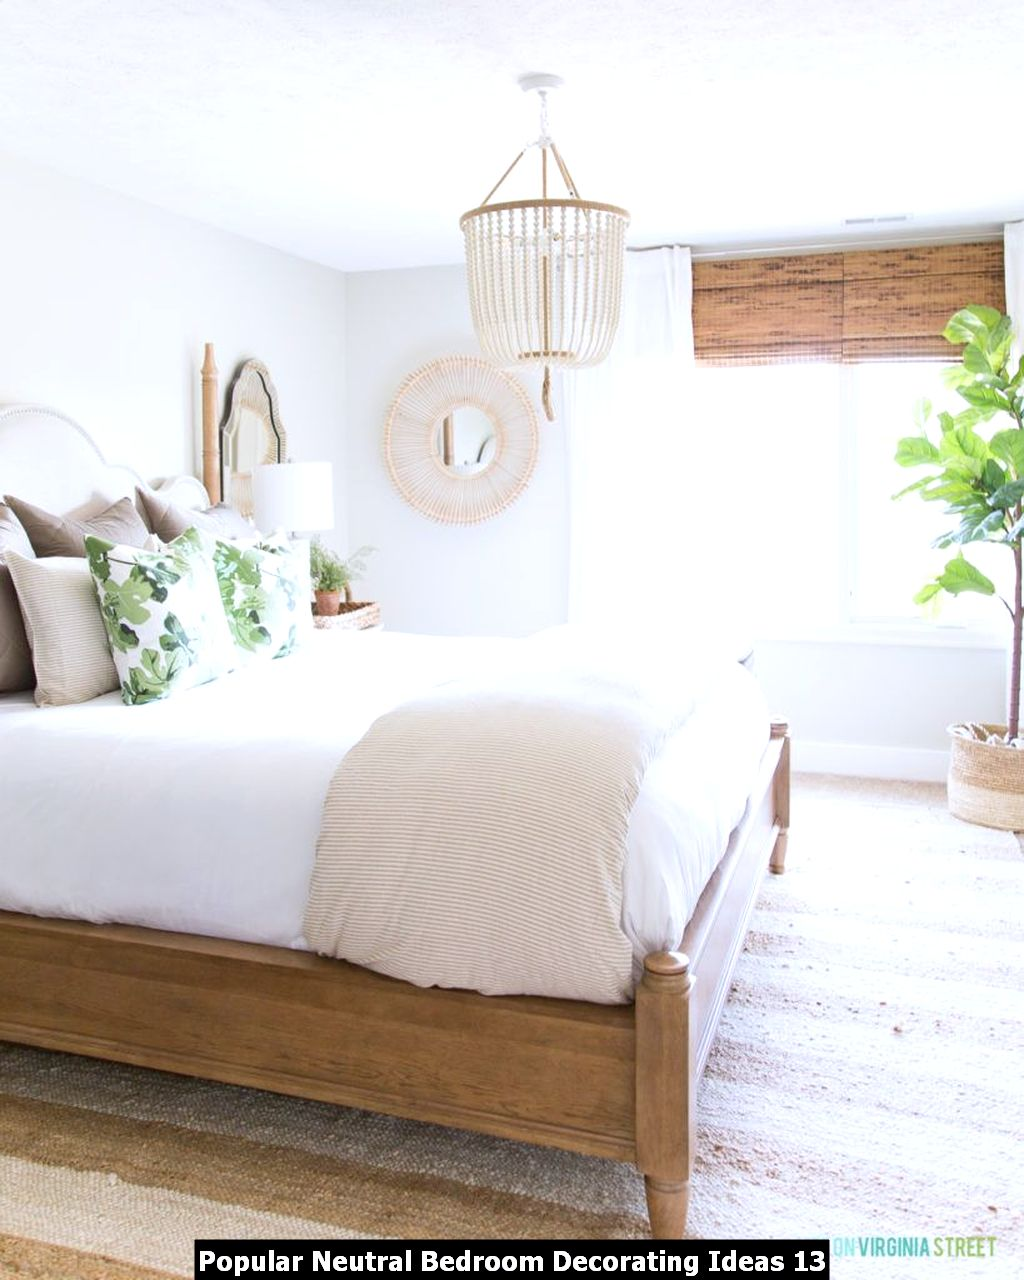 Popular Neutral Bedroom Decorating Ideas 13